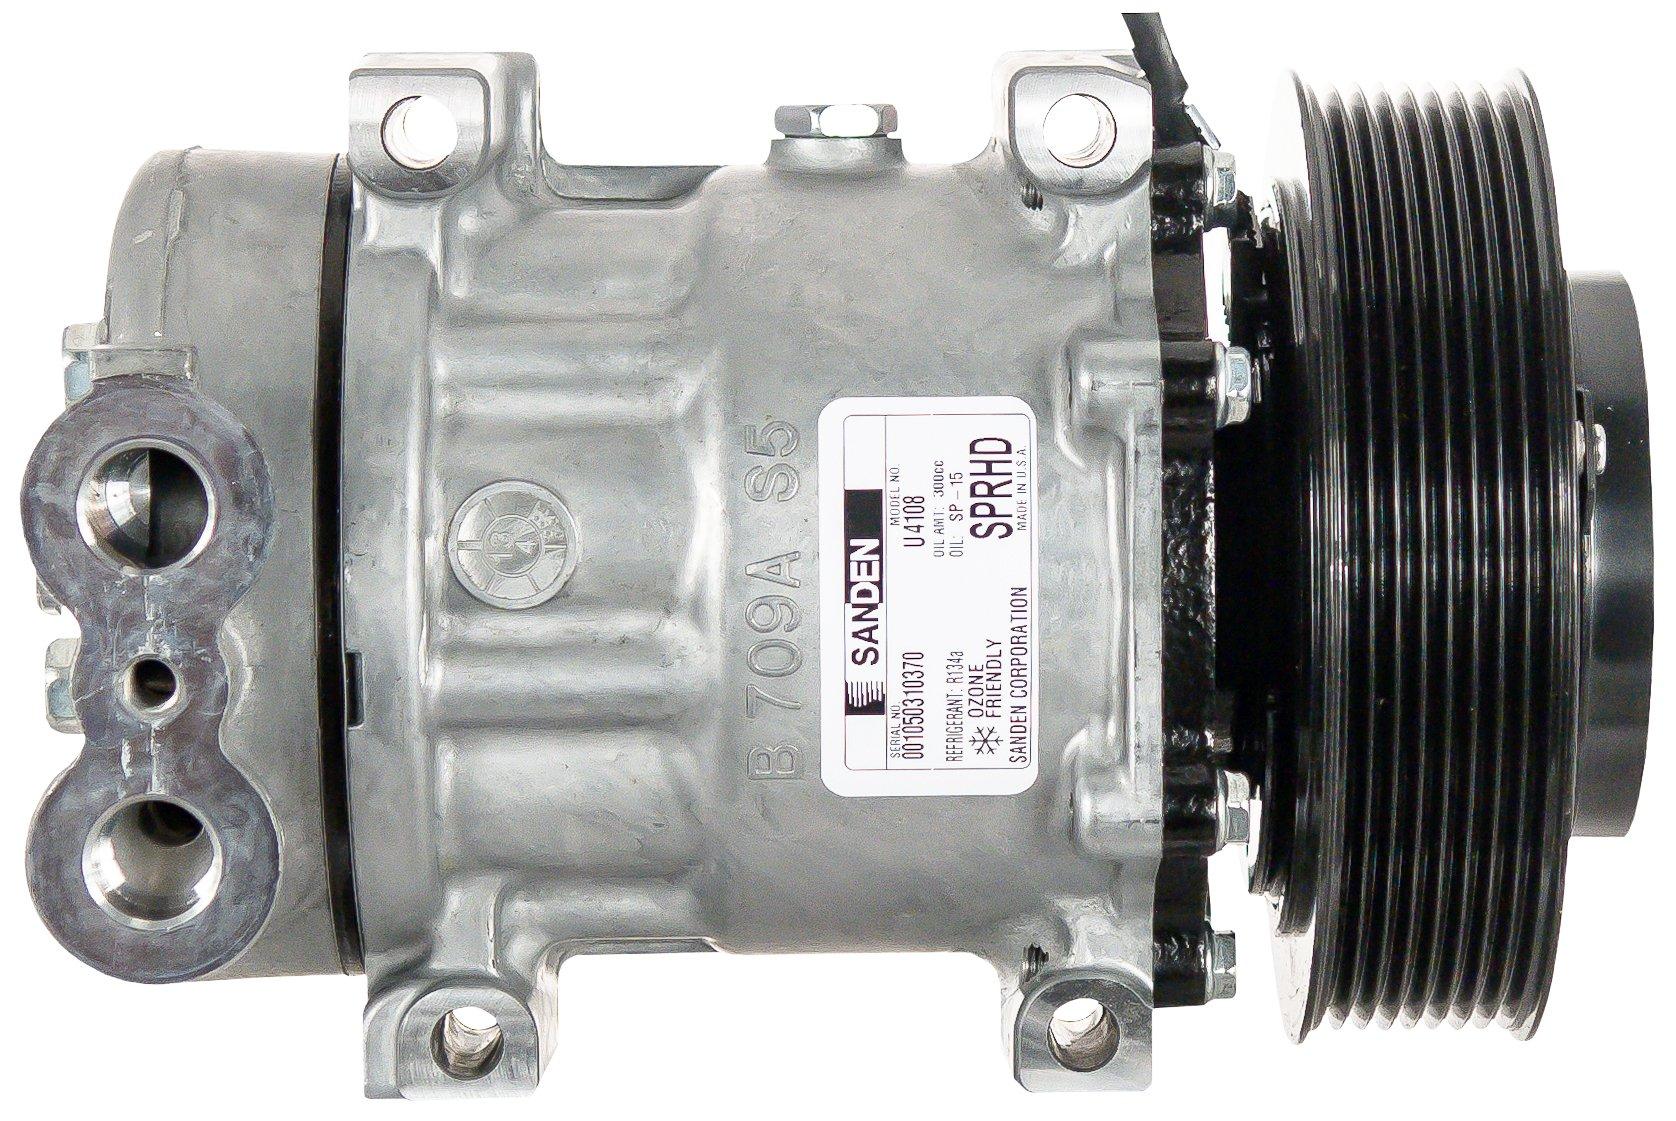 AirSource 5398 A/C Compressor (Sanden)